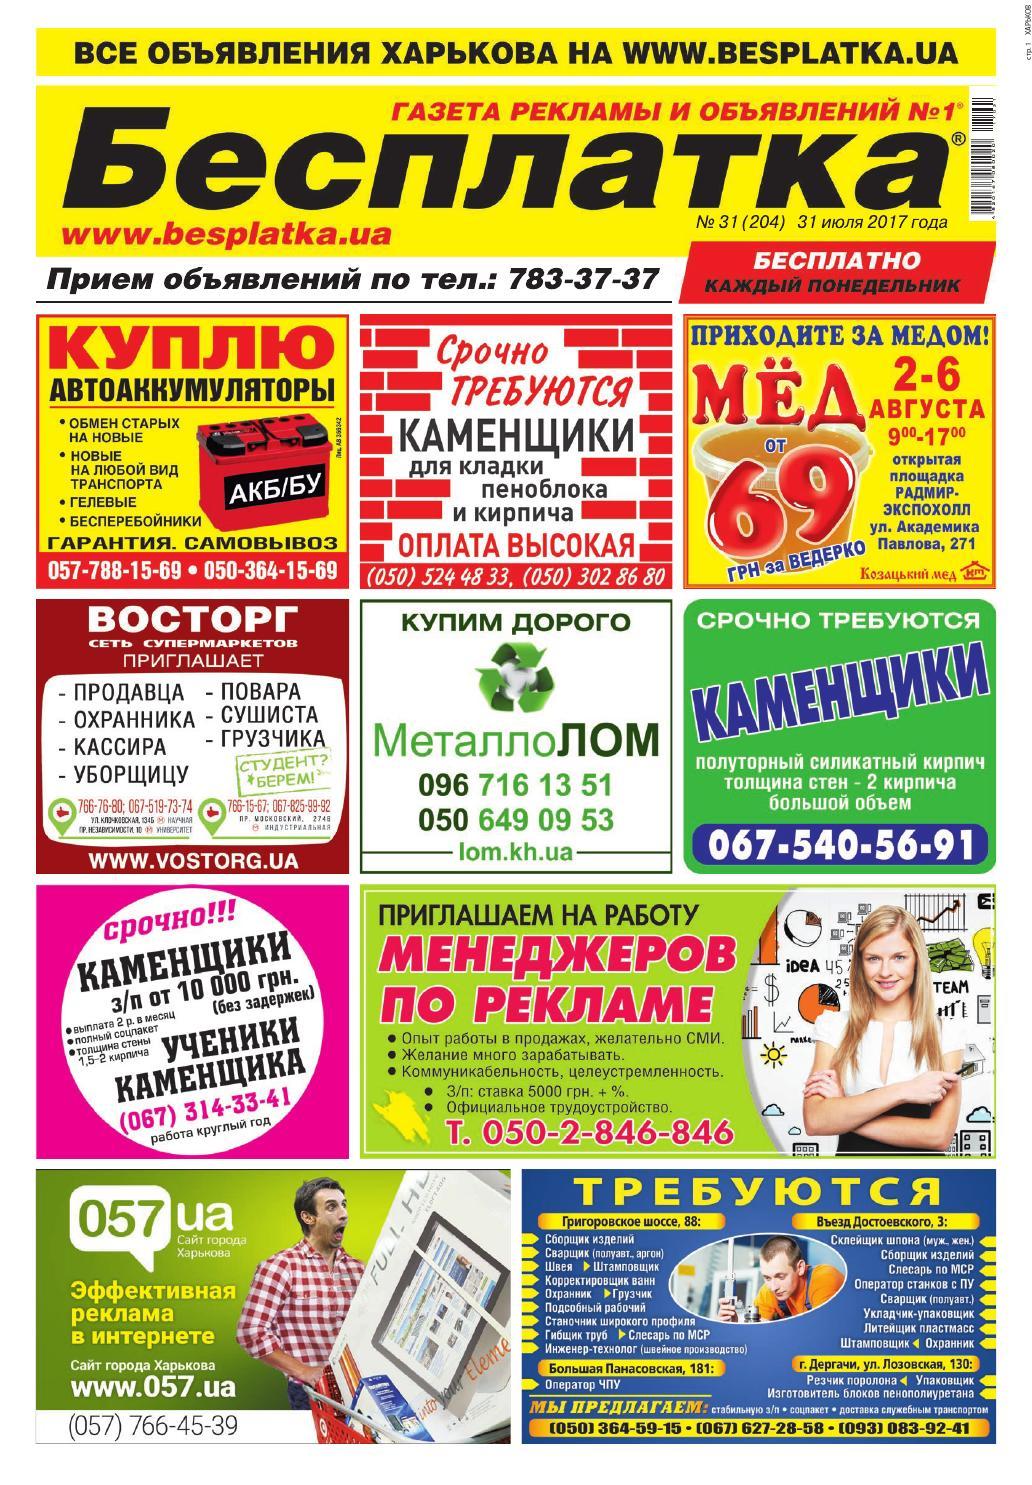 Besplatka  31 Харьков by besplatka ukraine - issuu 3c7367059e5